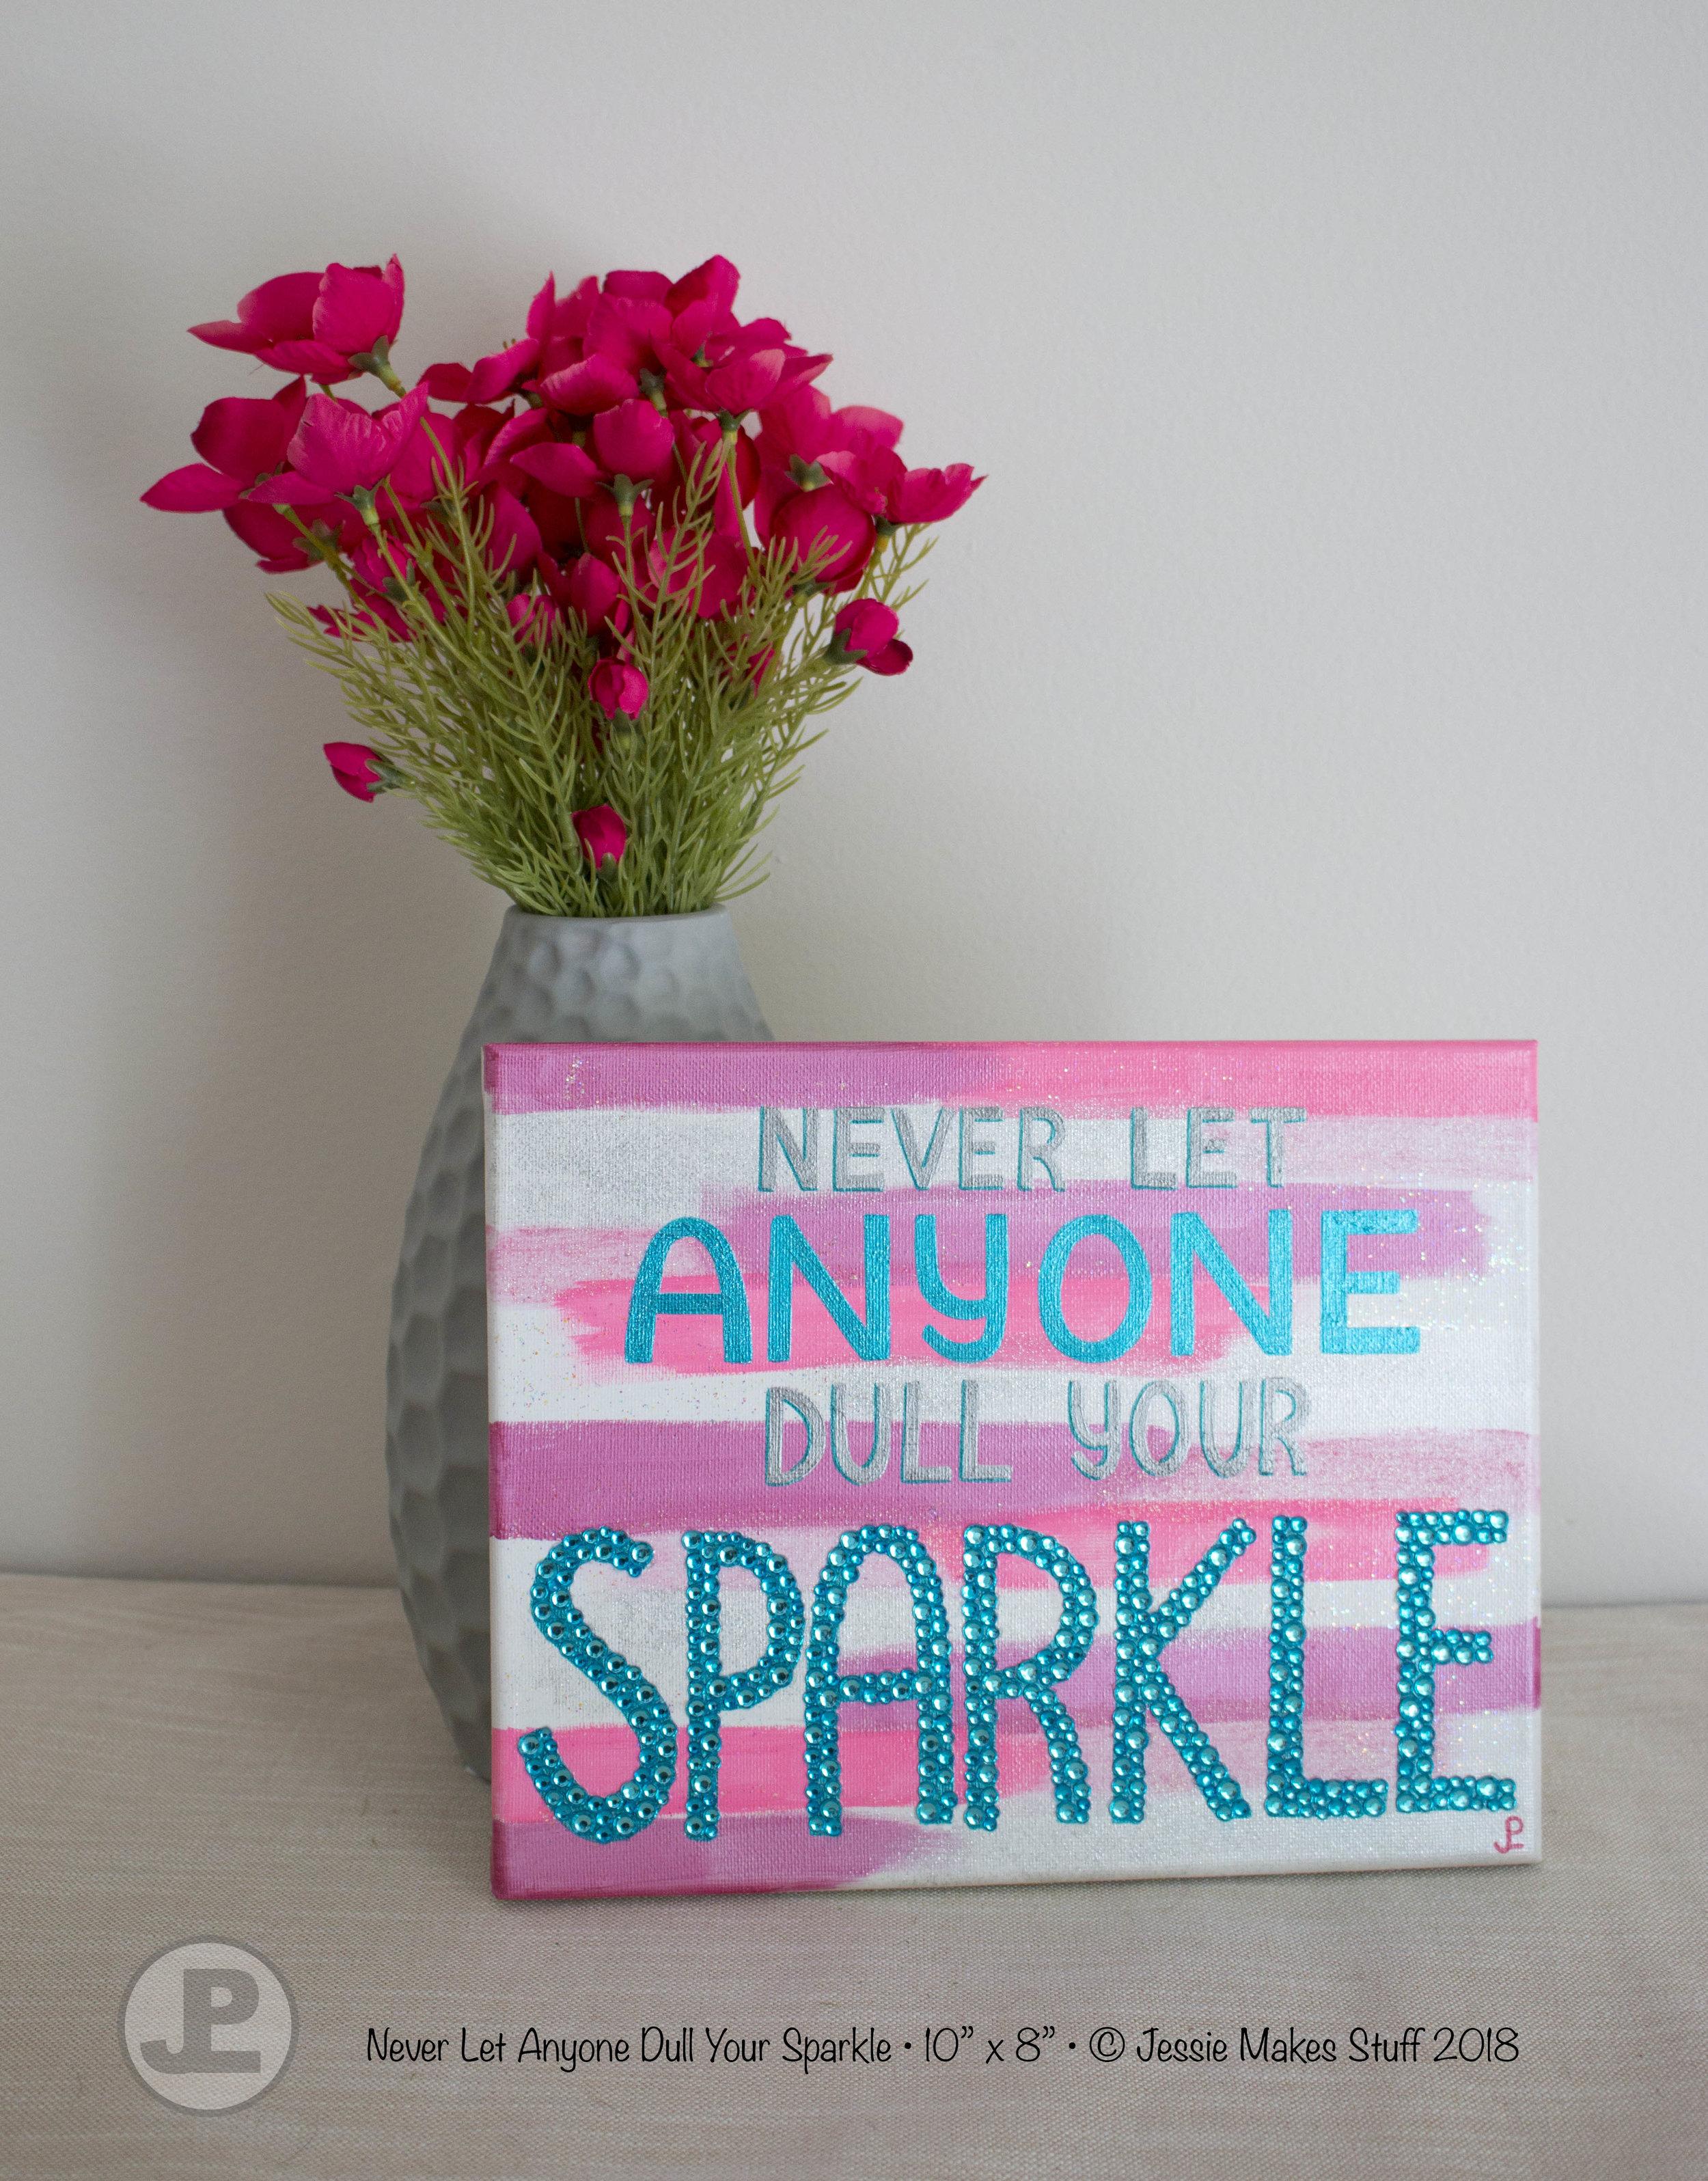 Sparkle_PinkTeal_8x10.jpg